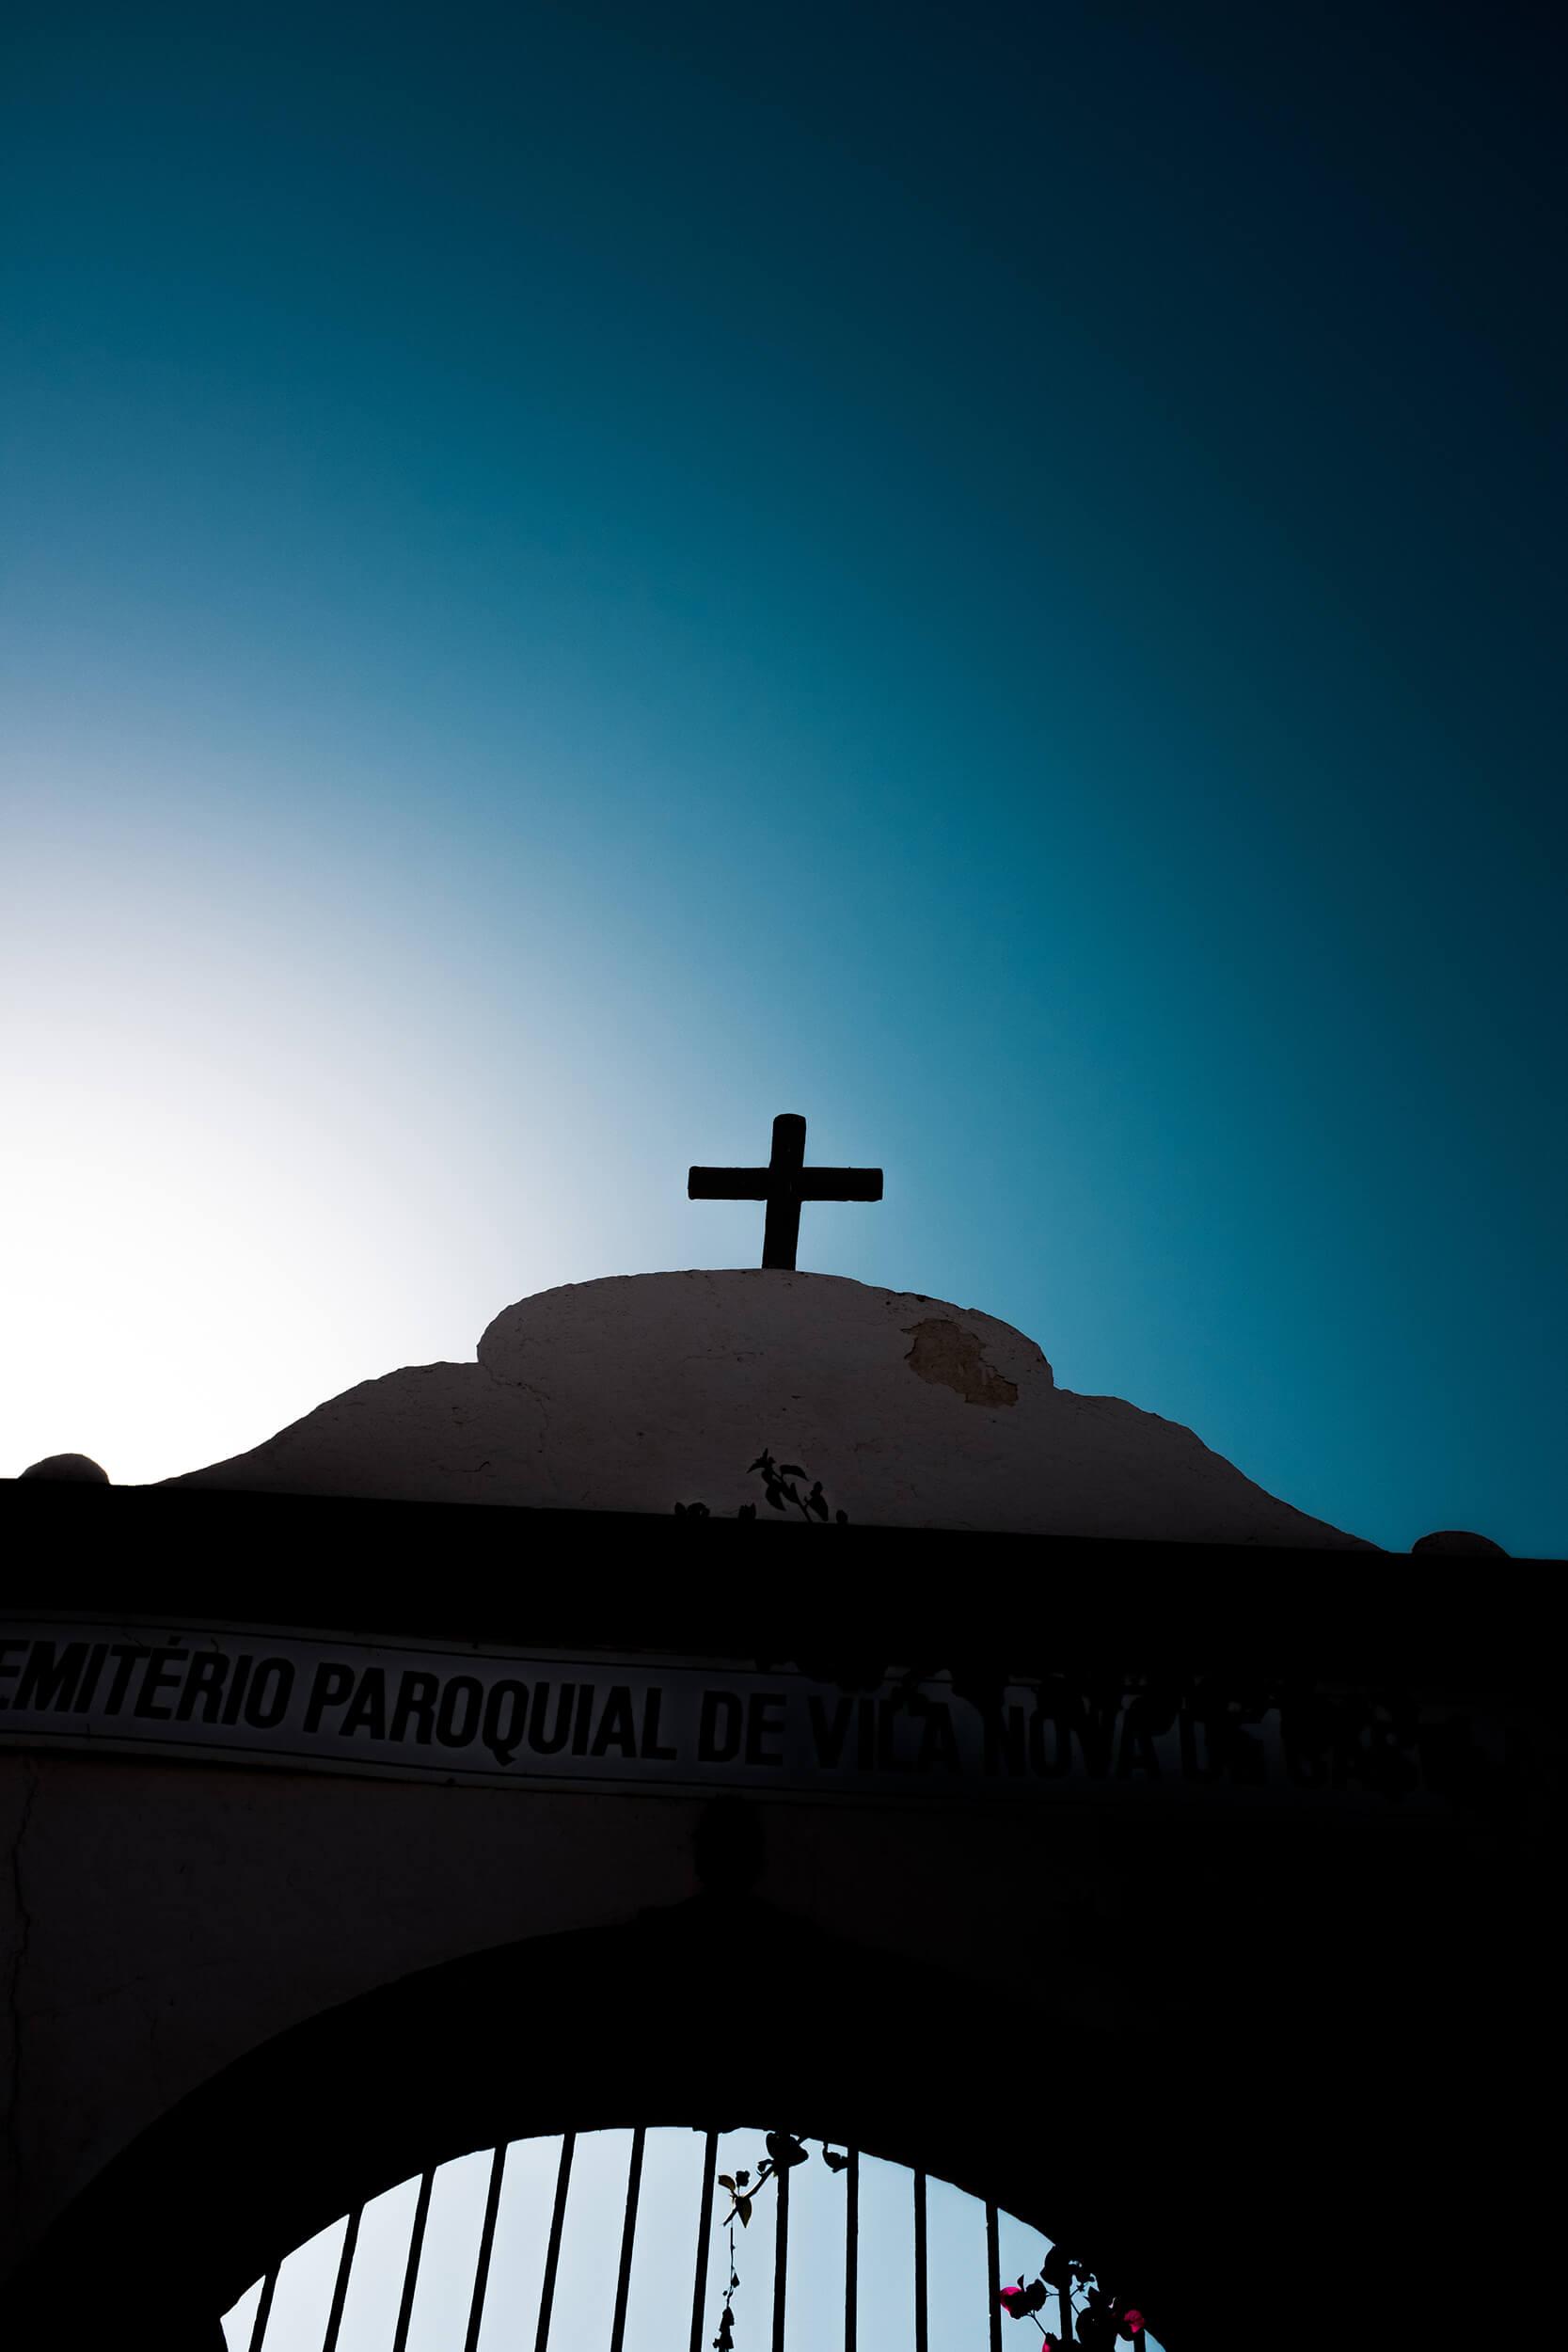 mystic-cemetery-portugal.jpg